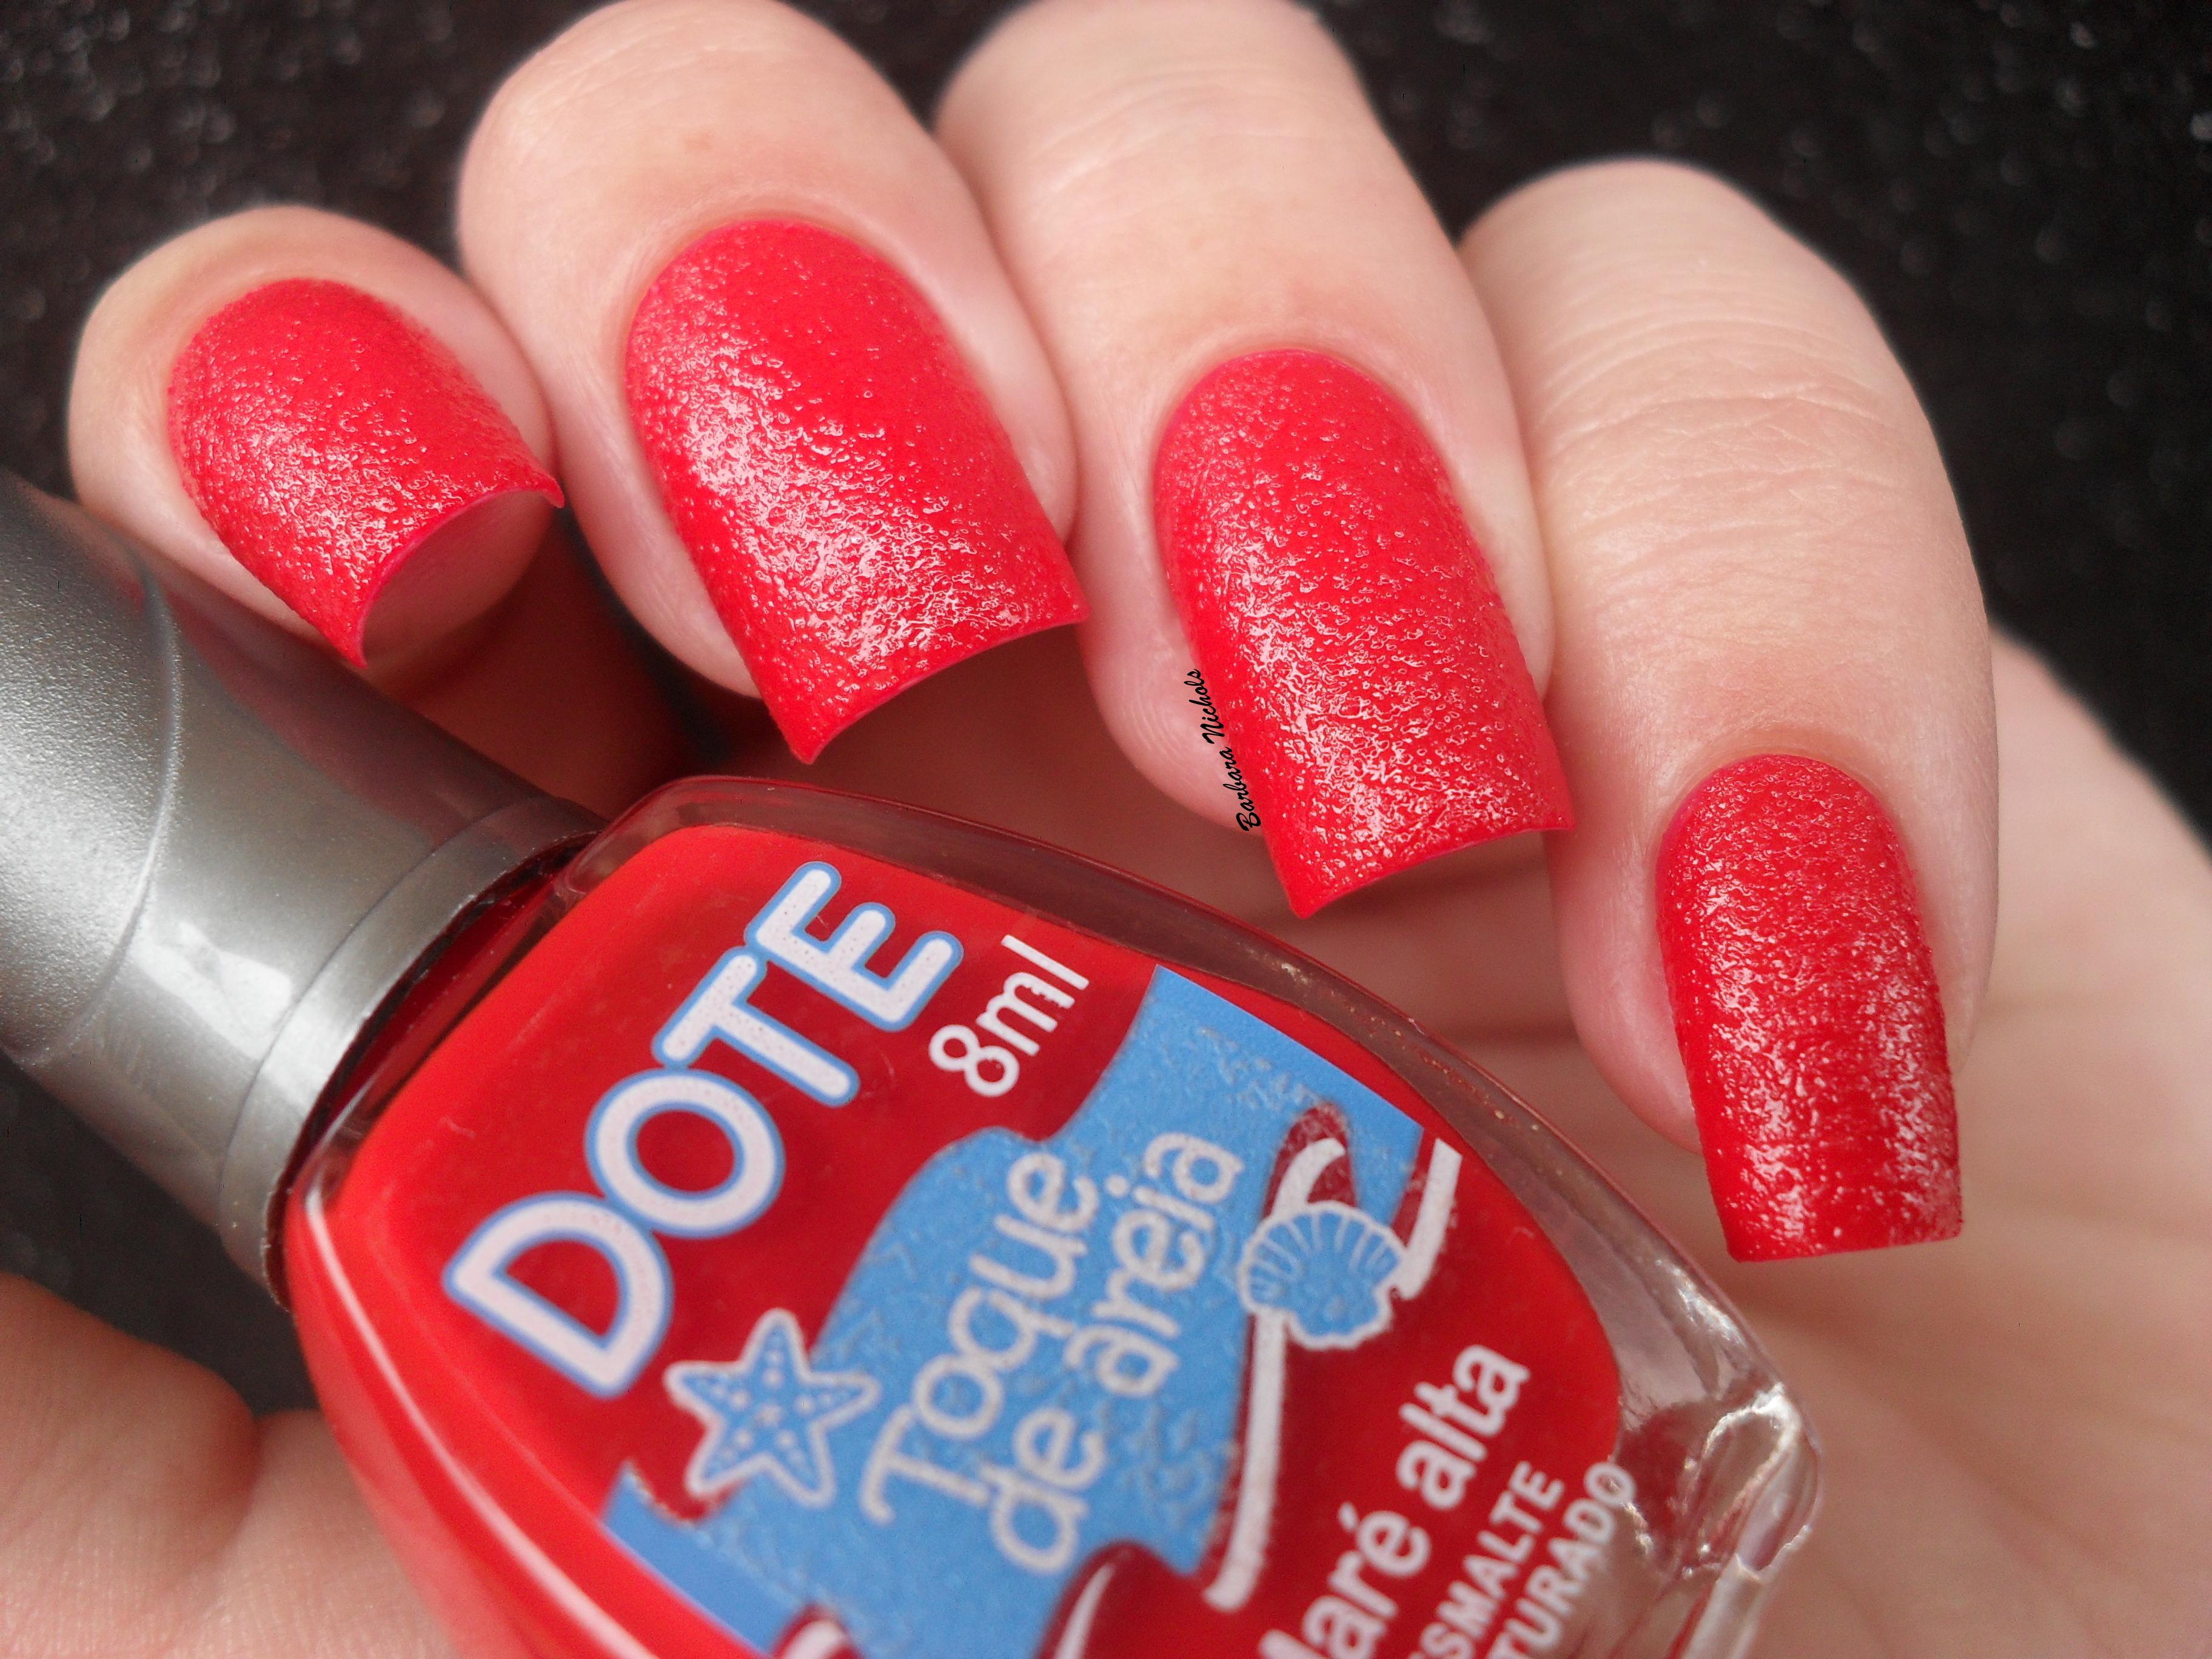 Sand Red Texture Polish Nails Hand Nail Finger Cosmetics Textura Rednails Nailpolish M Os Vermelho